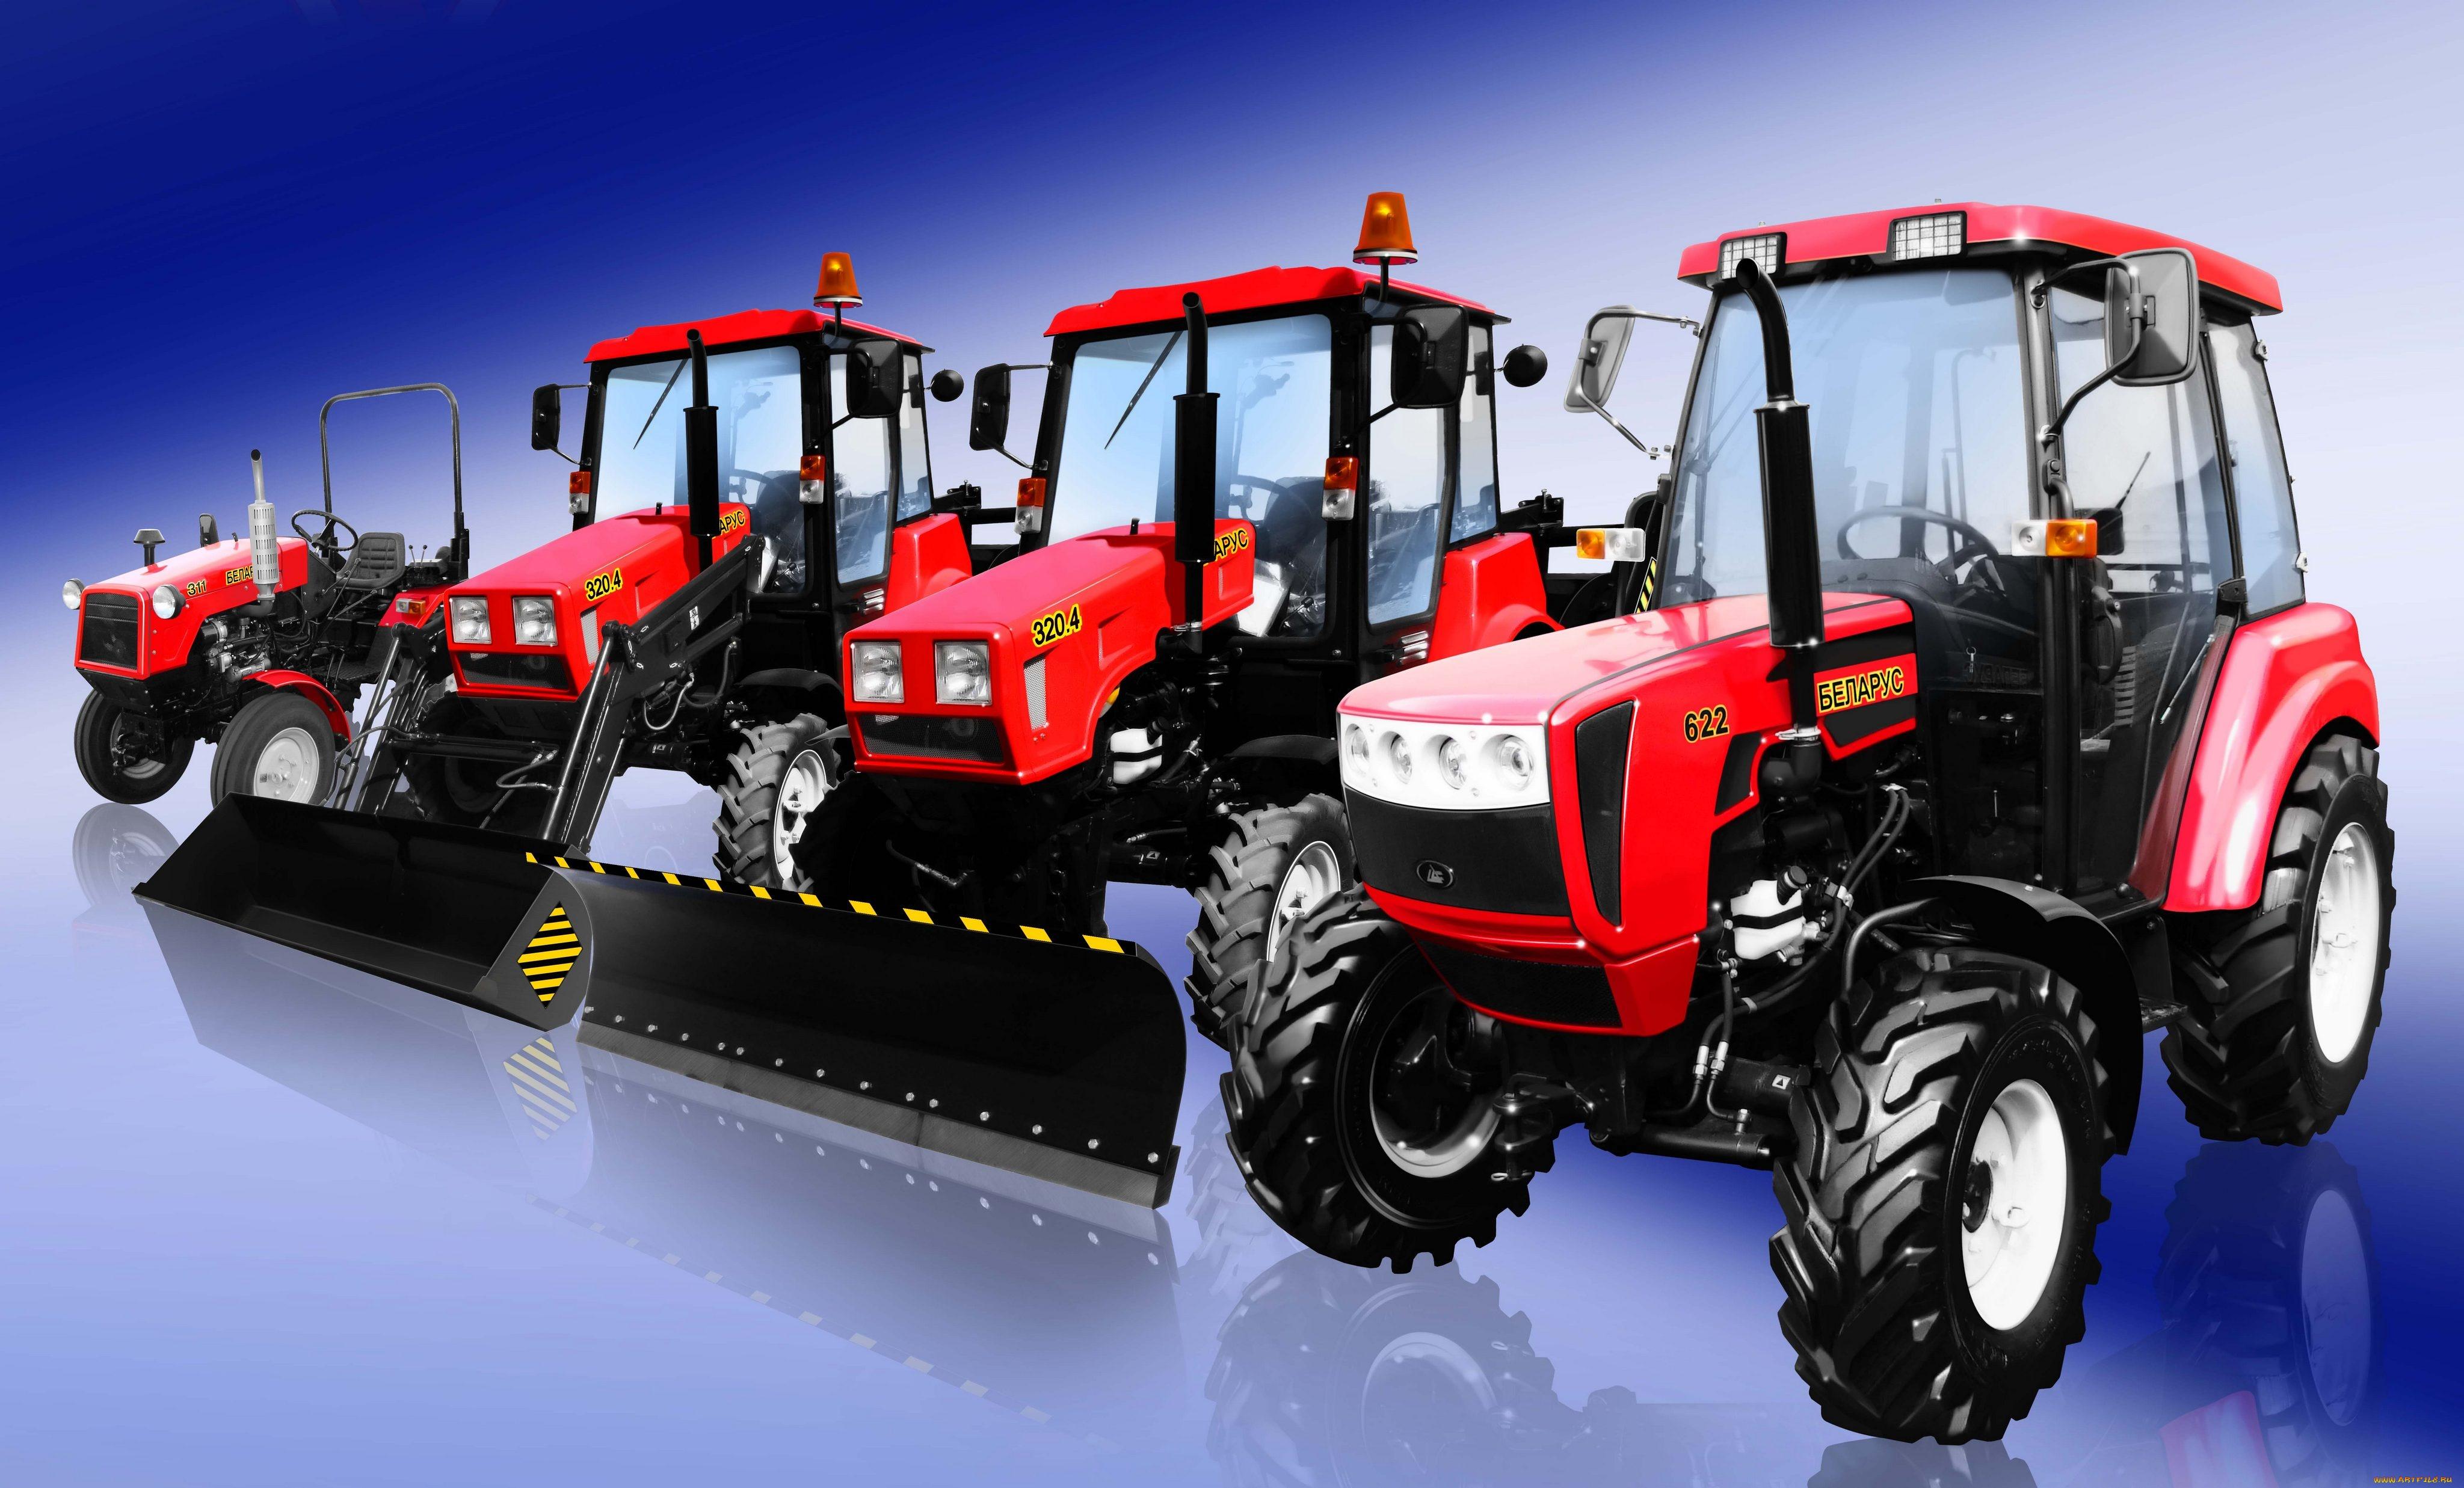 proizvodstvo-novoj-modeli-traktora-mtz-1-2